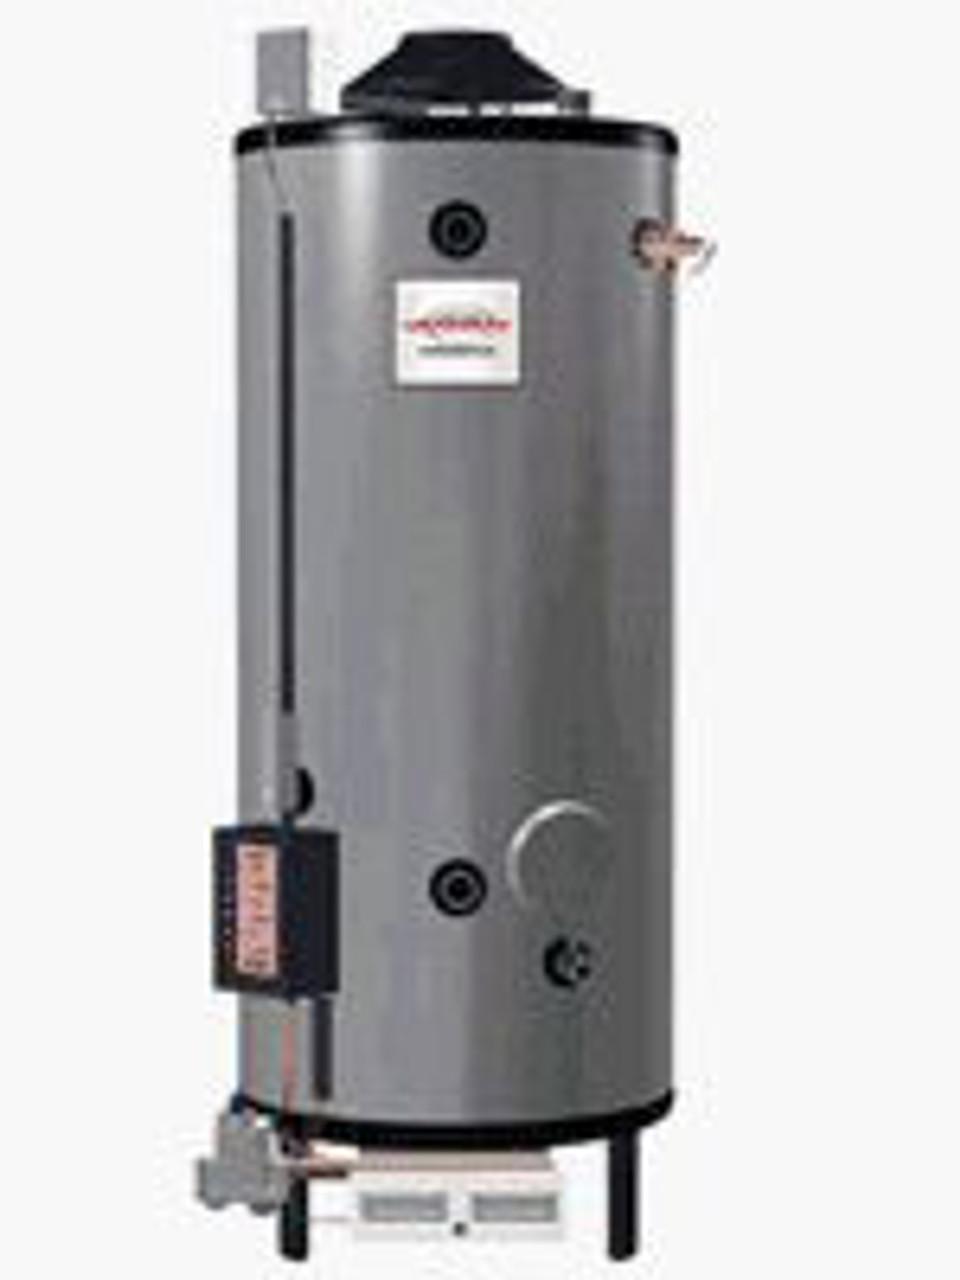 Rheem G100 200 Water Heater 100 Gallon Commercial Gas